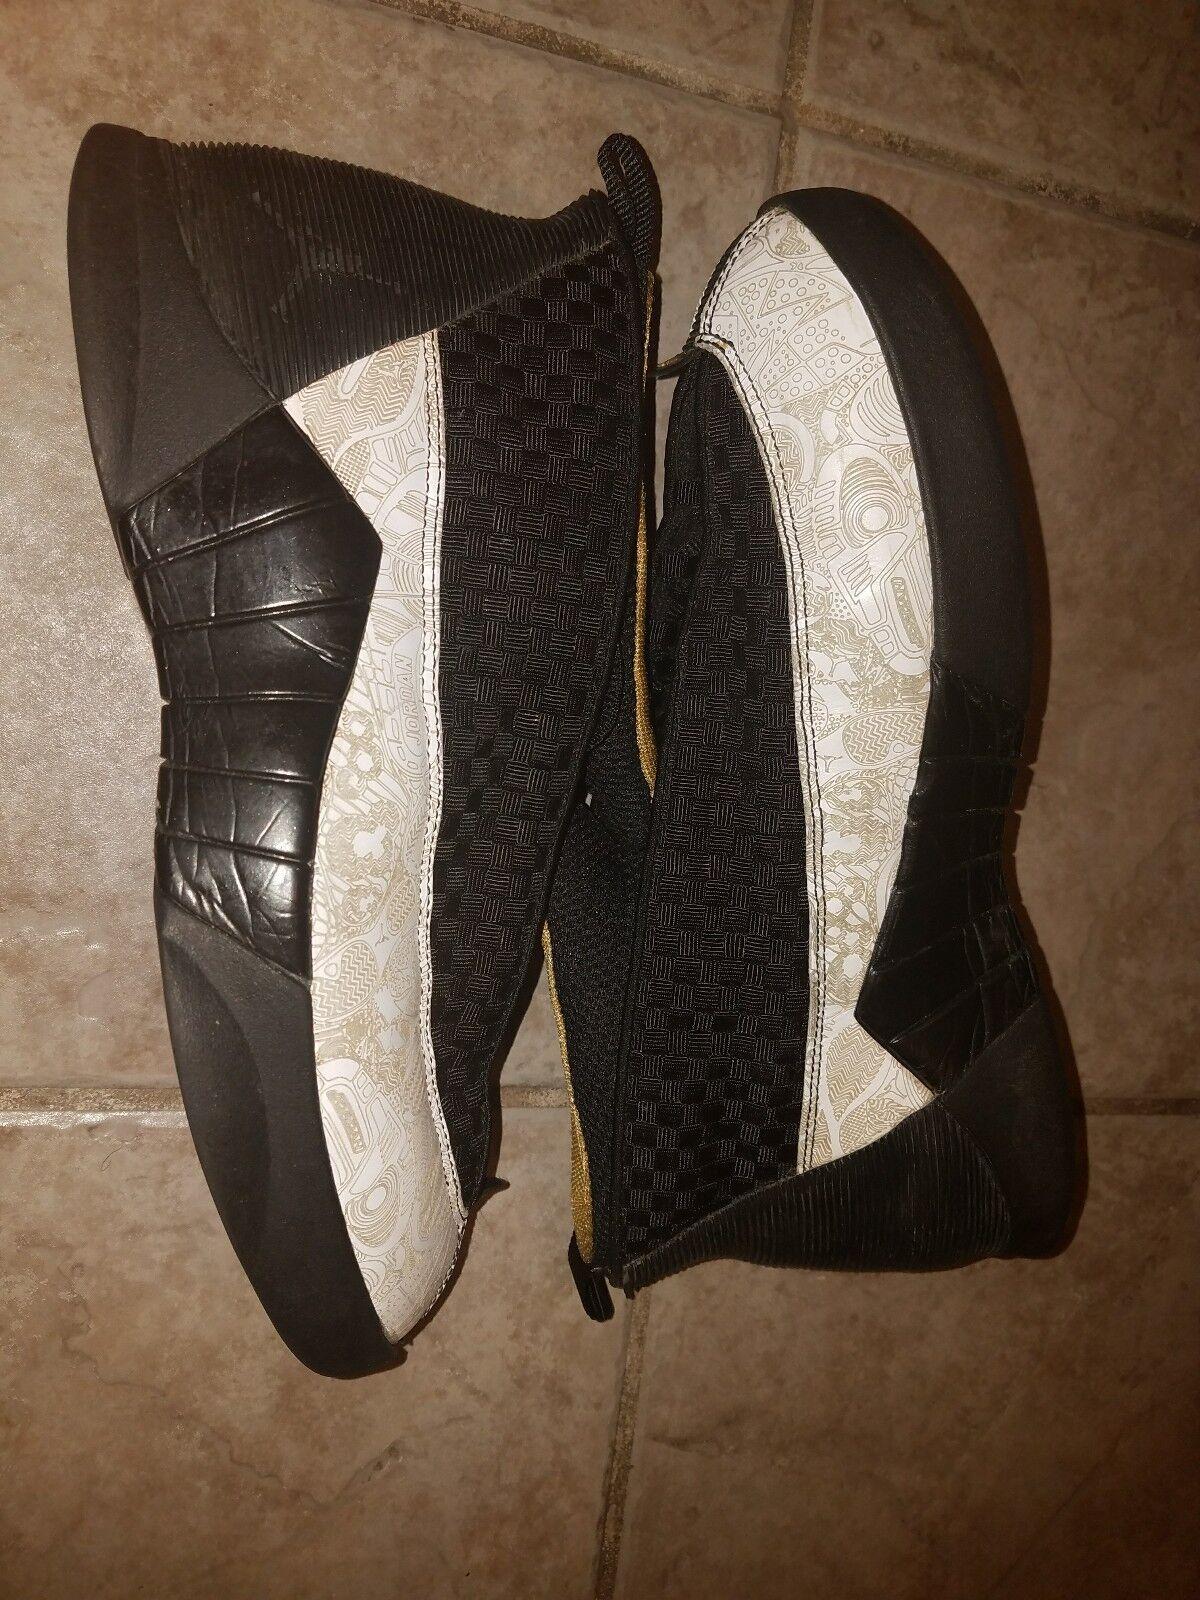 Nike Air Jordan laser XV 15 retro LS laser Jordan comodo Wild Casual Shoes 4a8051